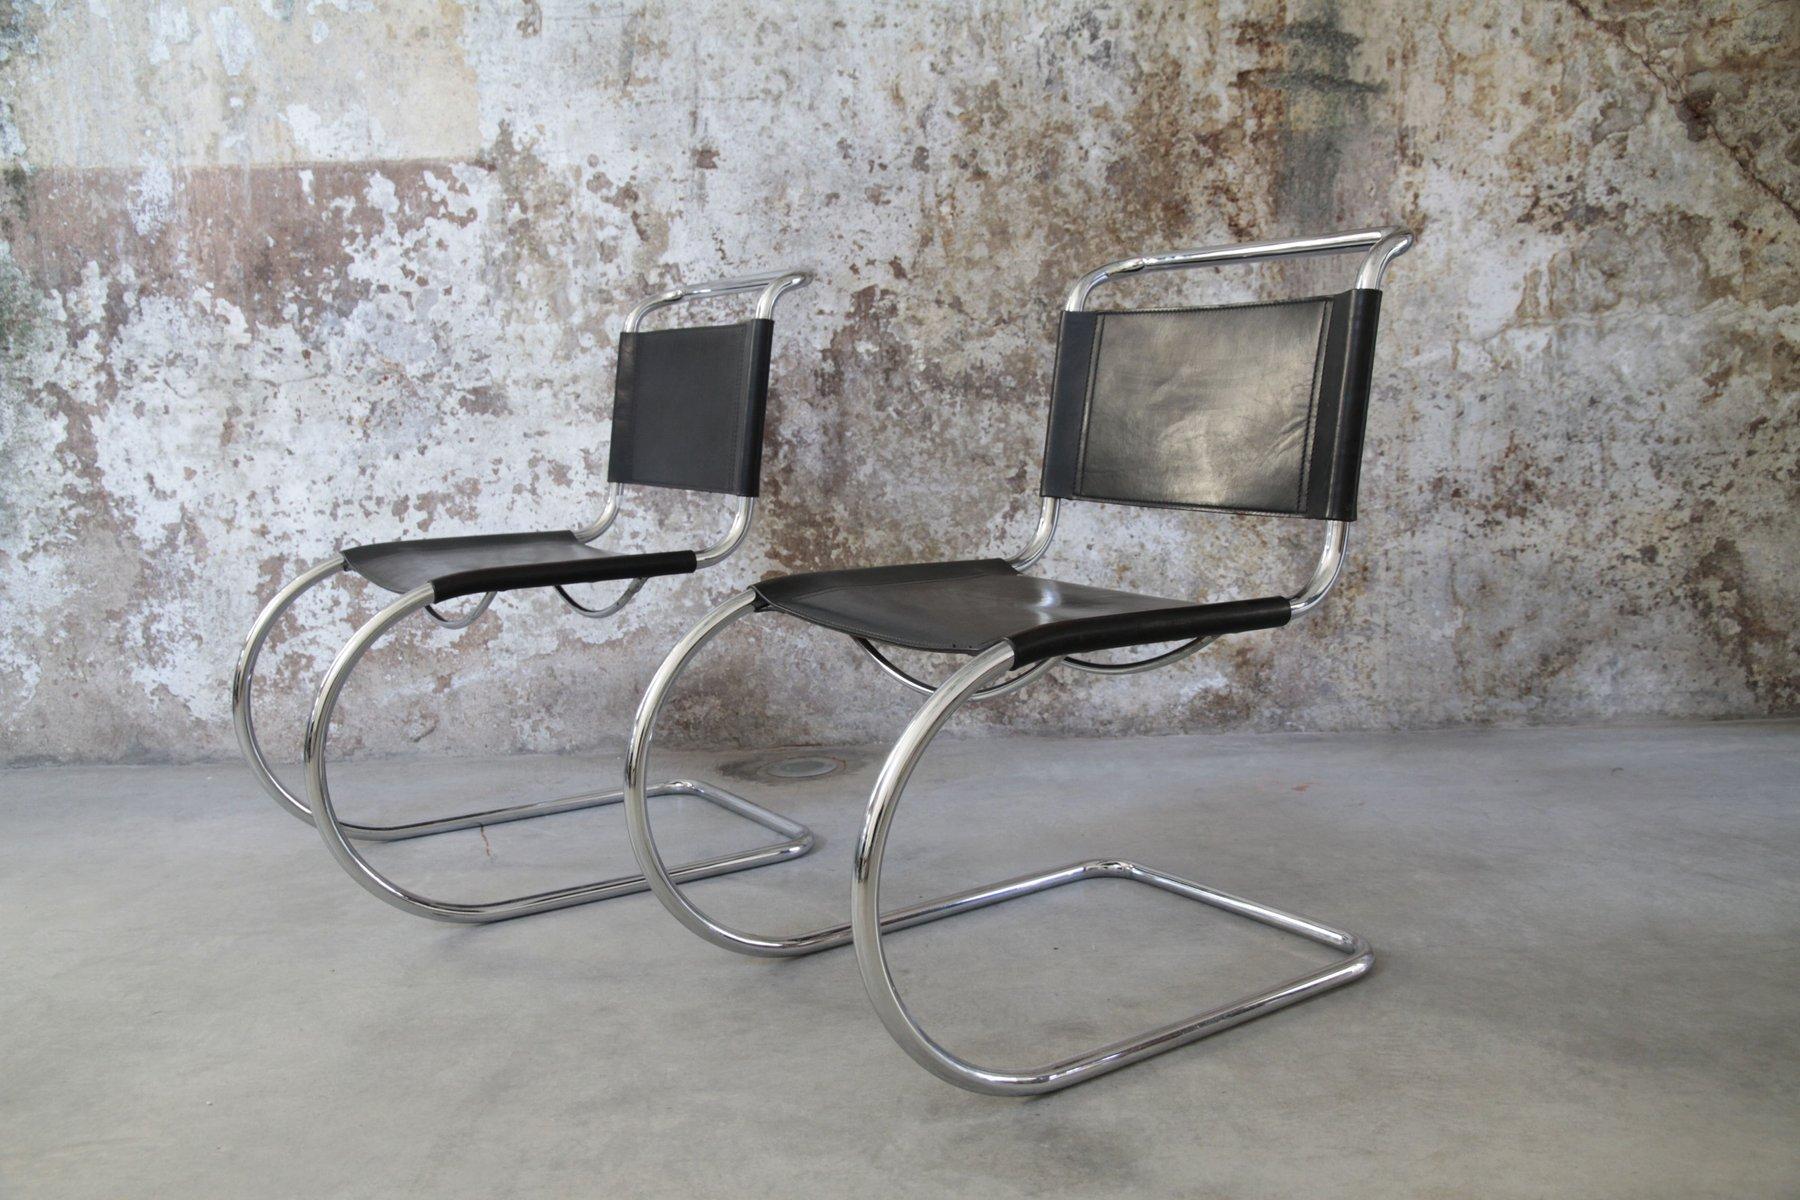 vintage mr 10 stuhl aus stahlrohr von ludwig mies van der. Black Bedroom Furniture Sets. Home Design Ideas